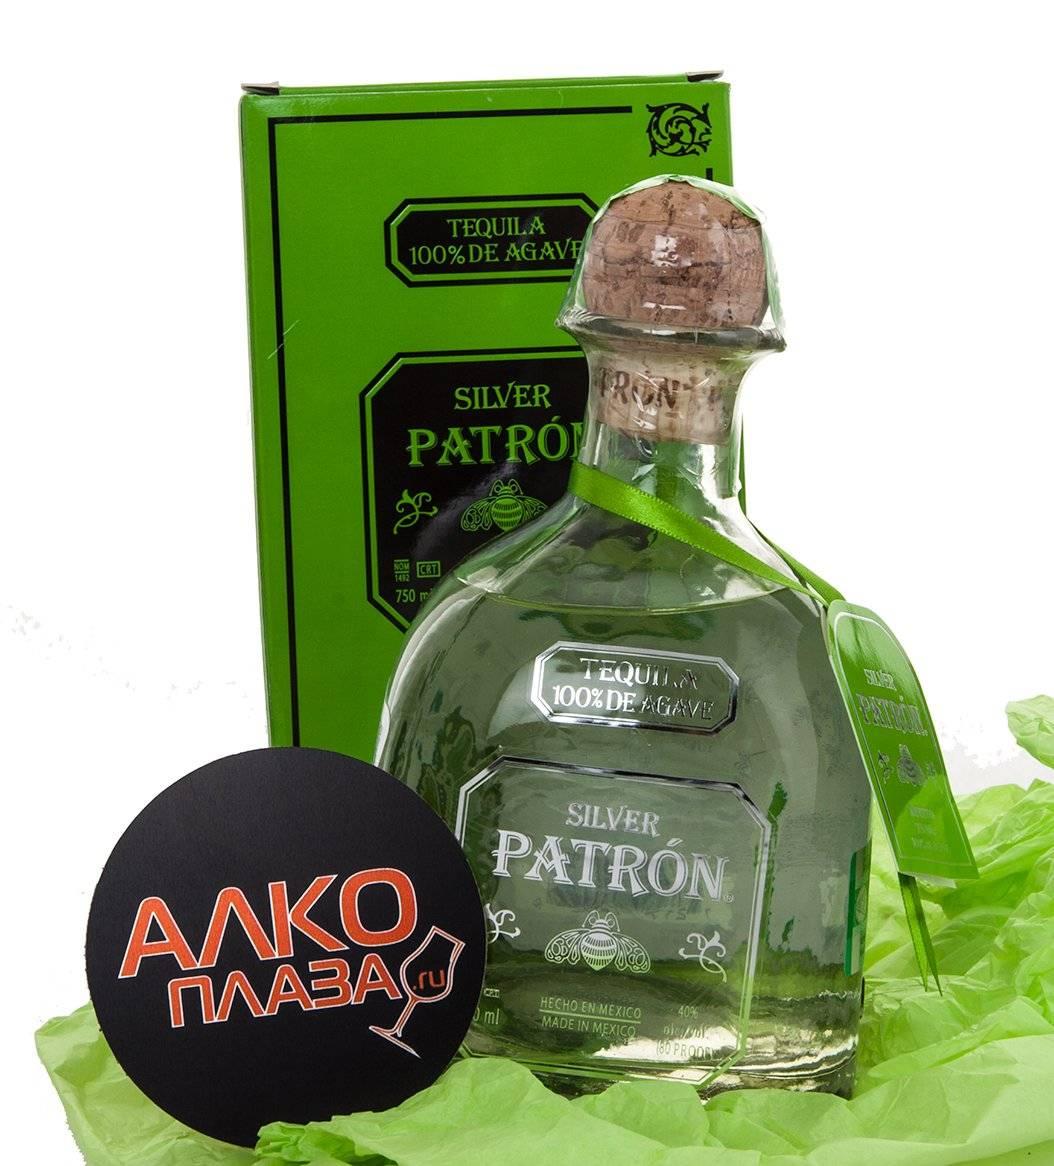 Tequila patron silver — история алкоголя